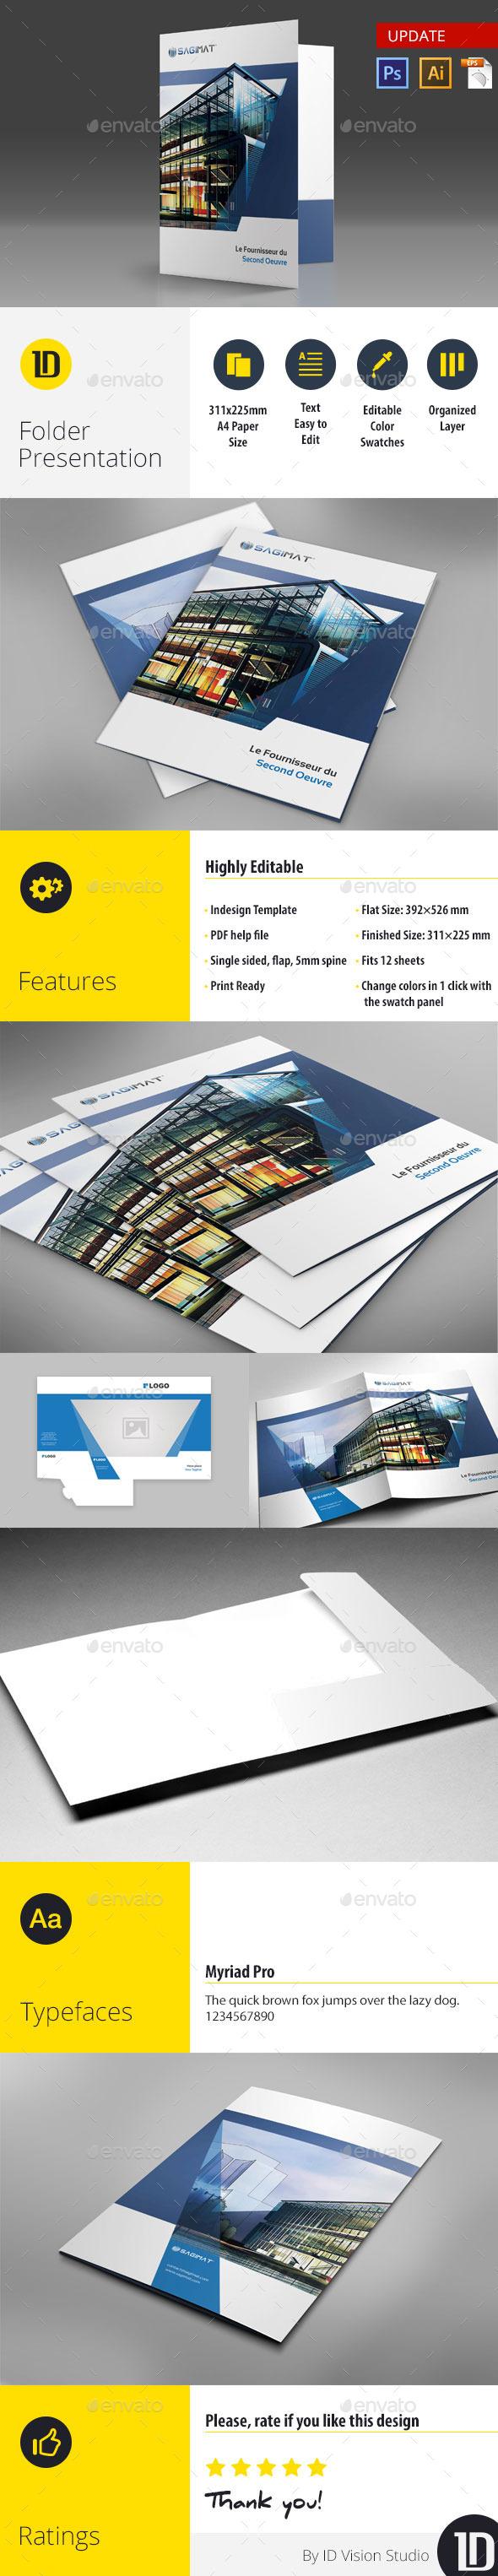 A4 Self Locking Multipurpose Presentation Folder 001 - Stationery Print Templates